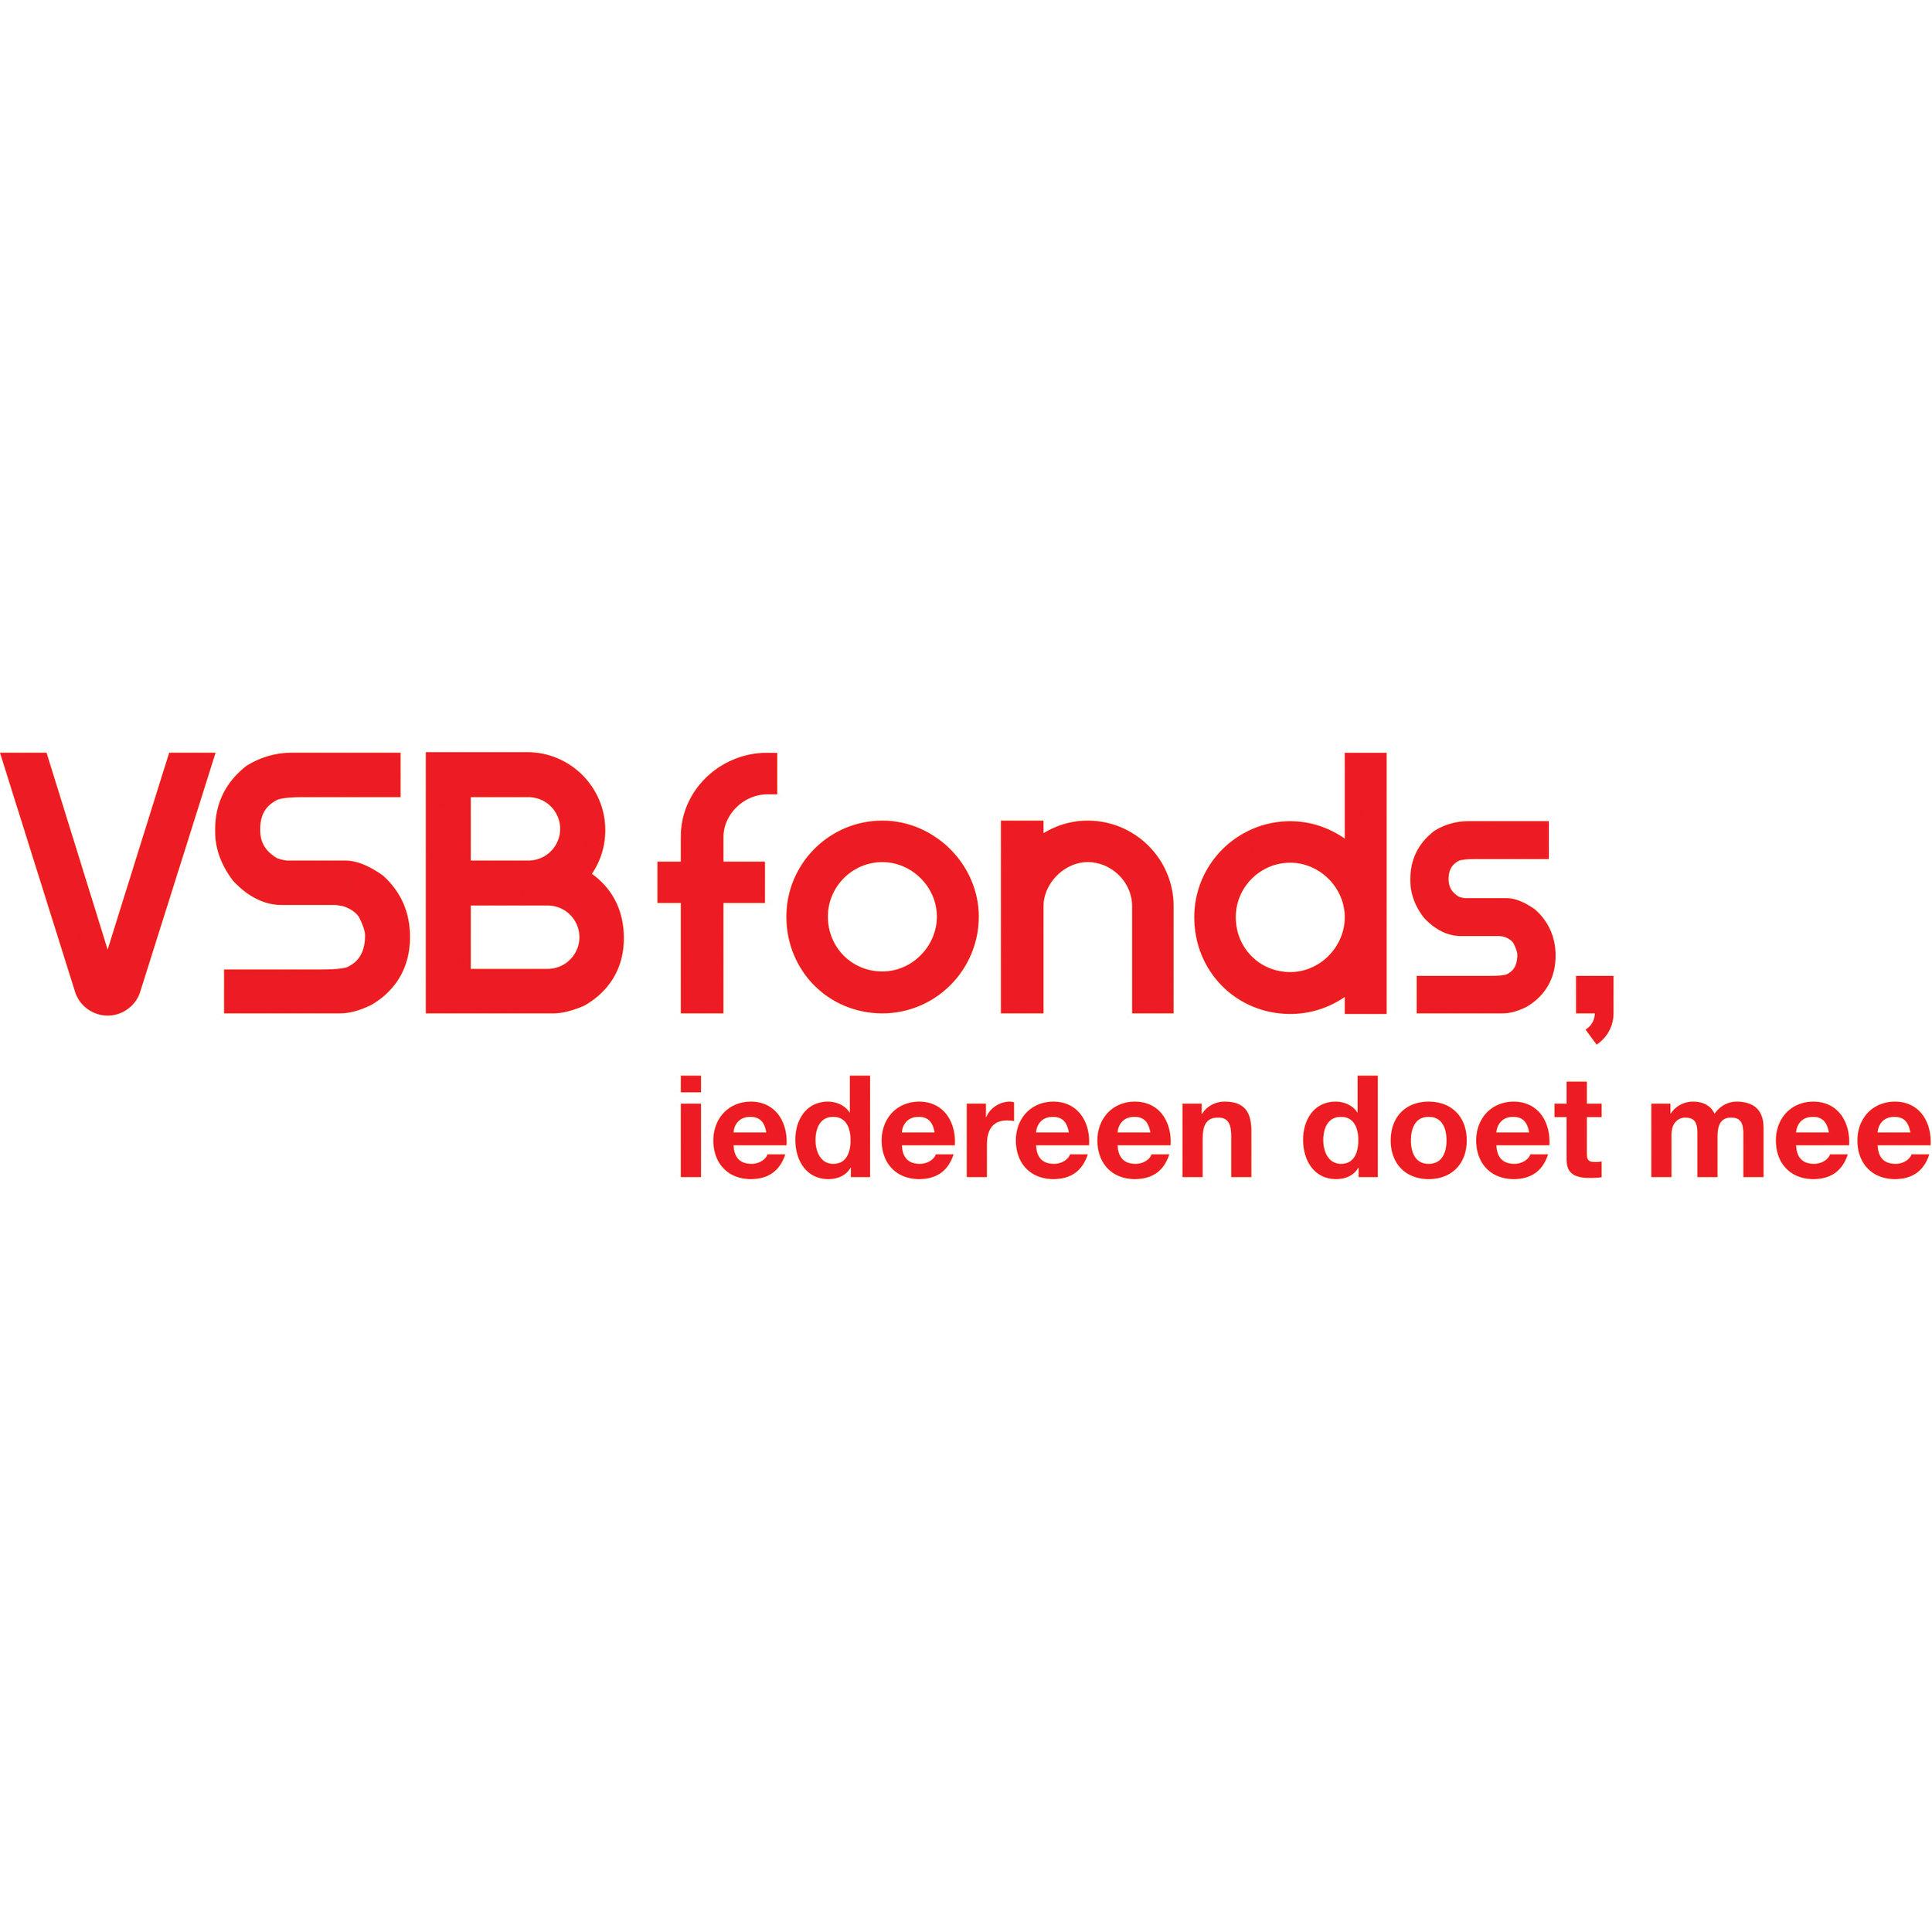 vsbfonds-pay-off-rgb.jpg